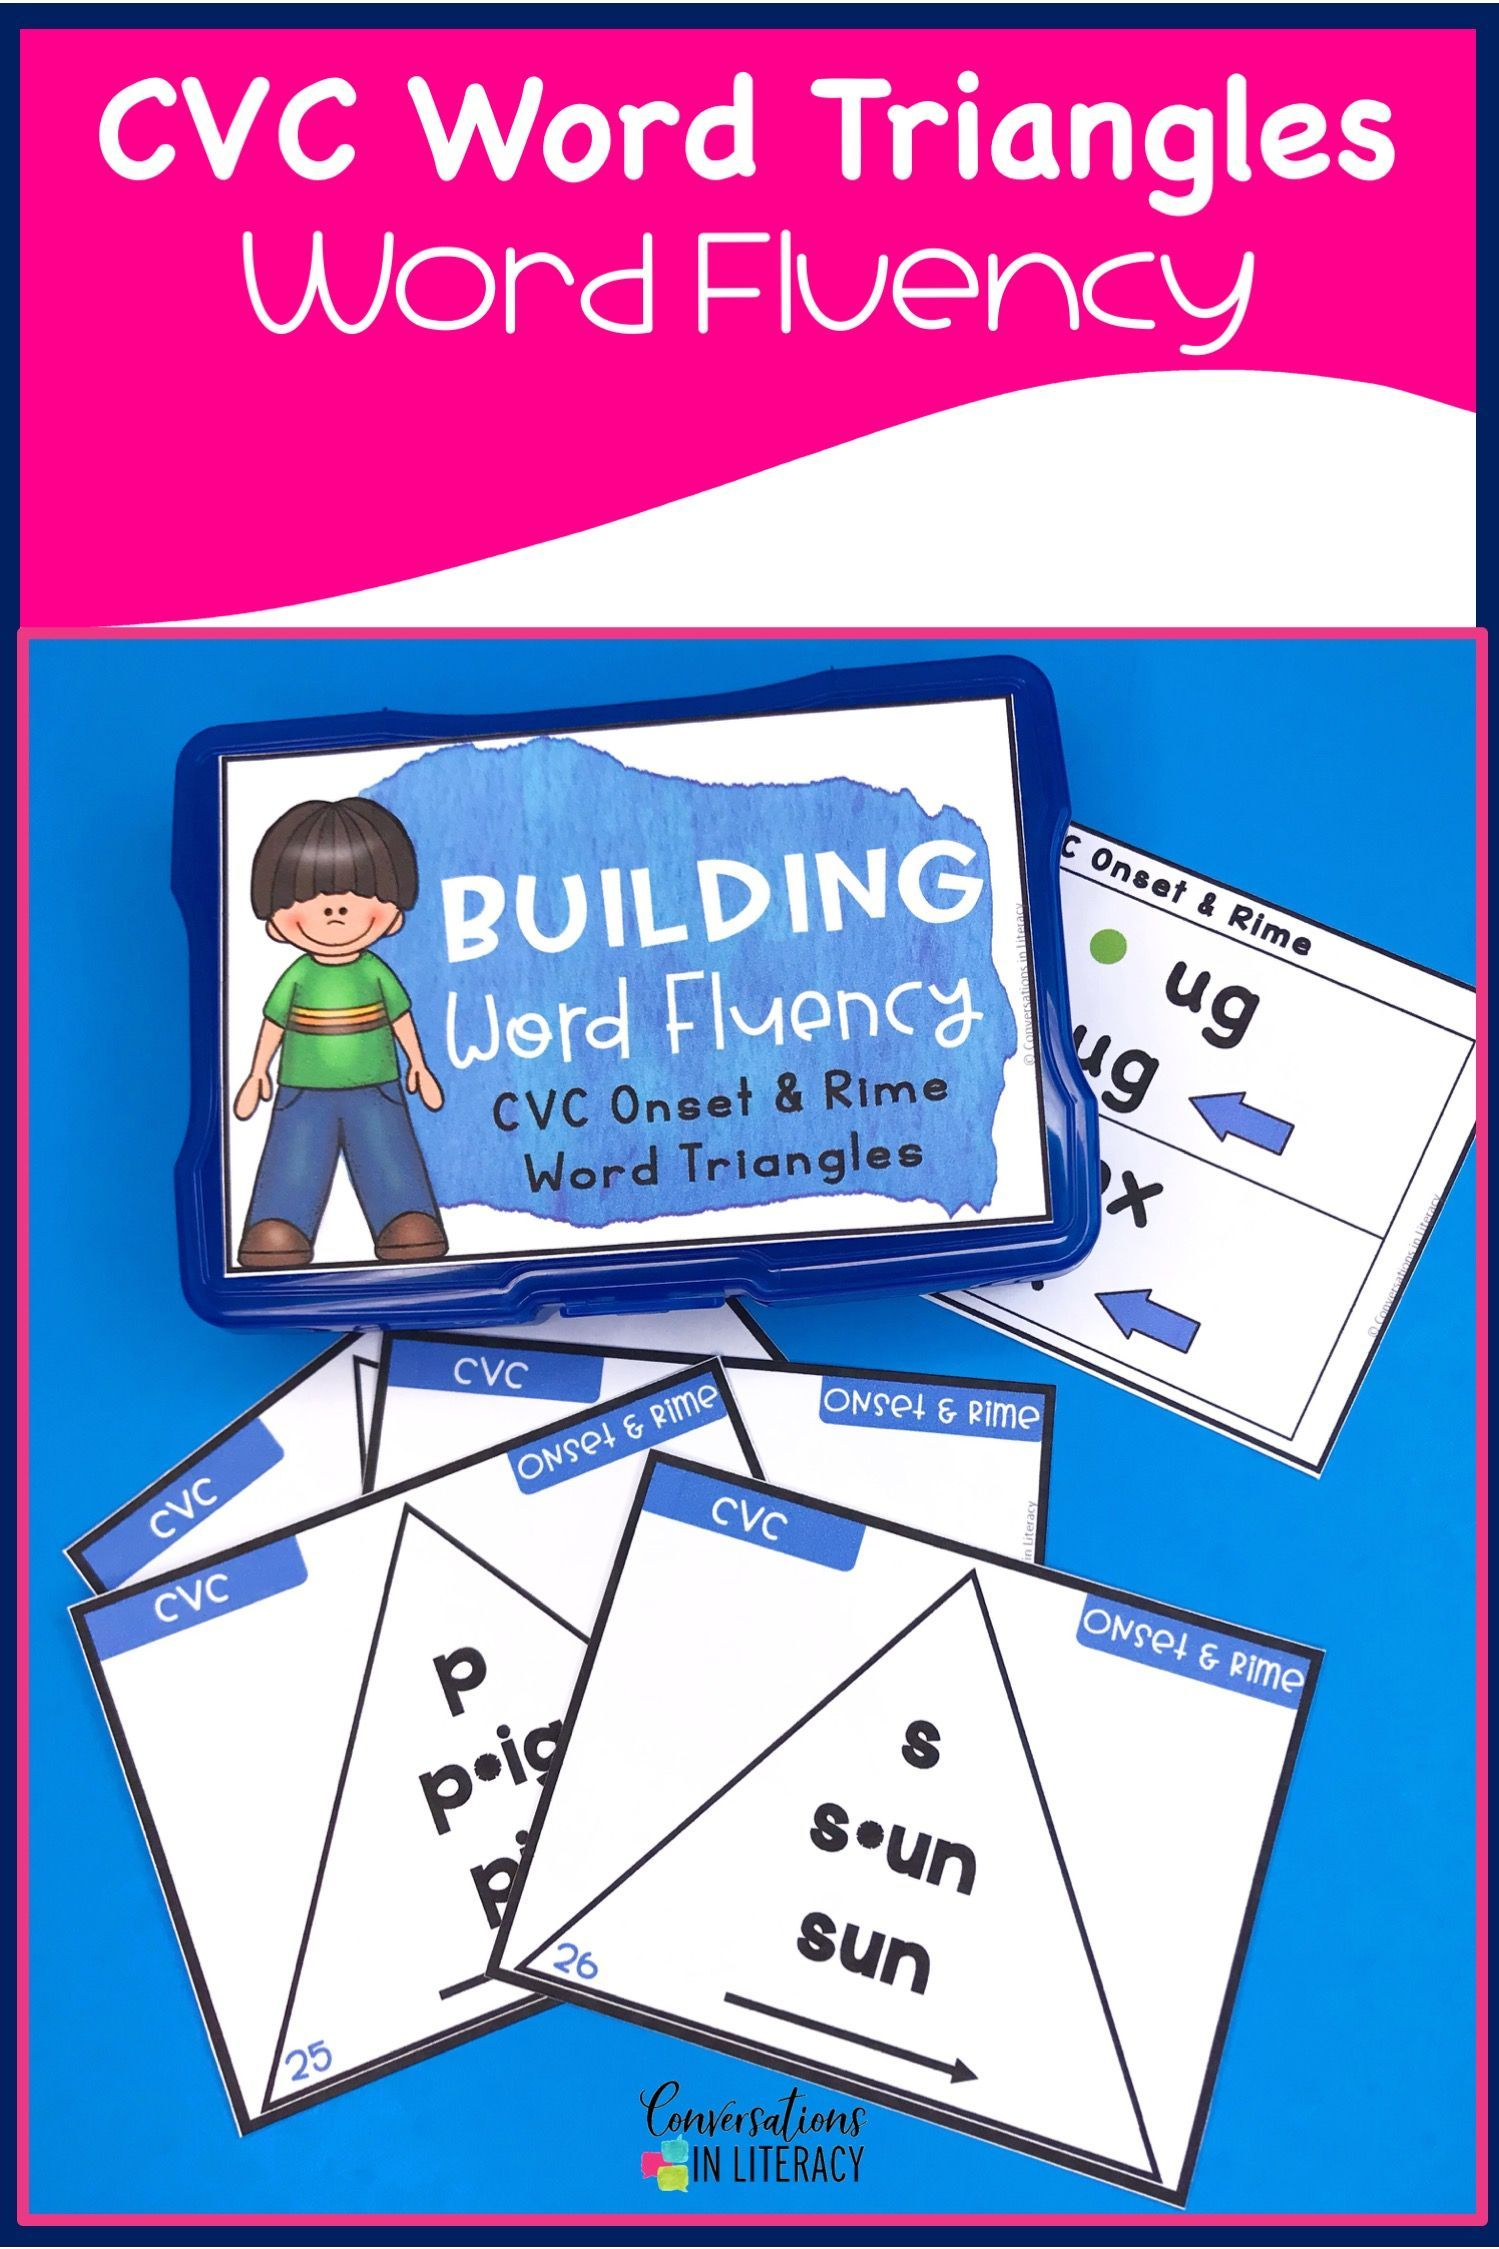 Short Vowel Cvc Onset And Rime Building Word Fluency